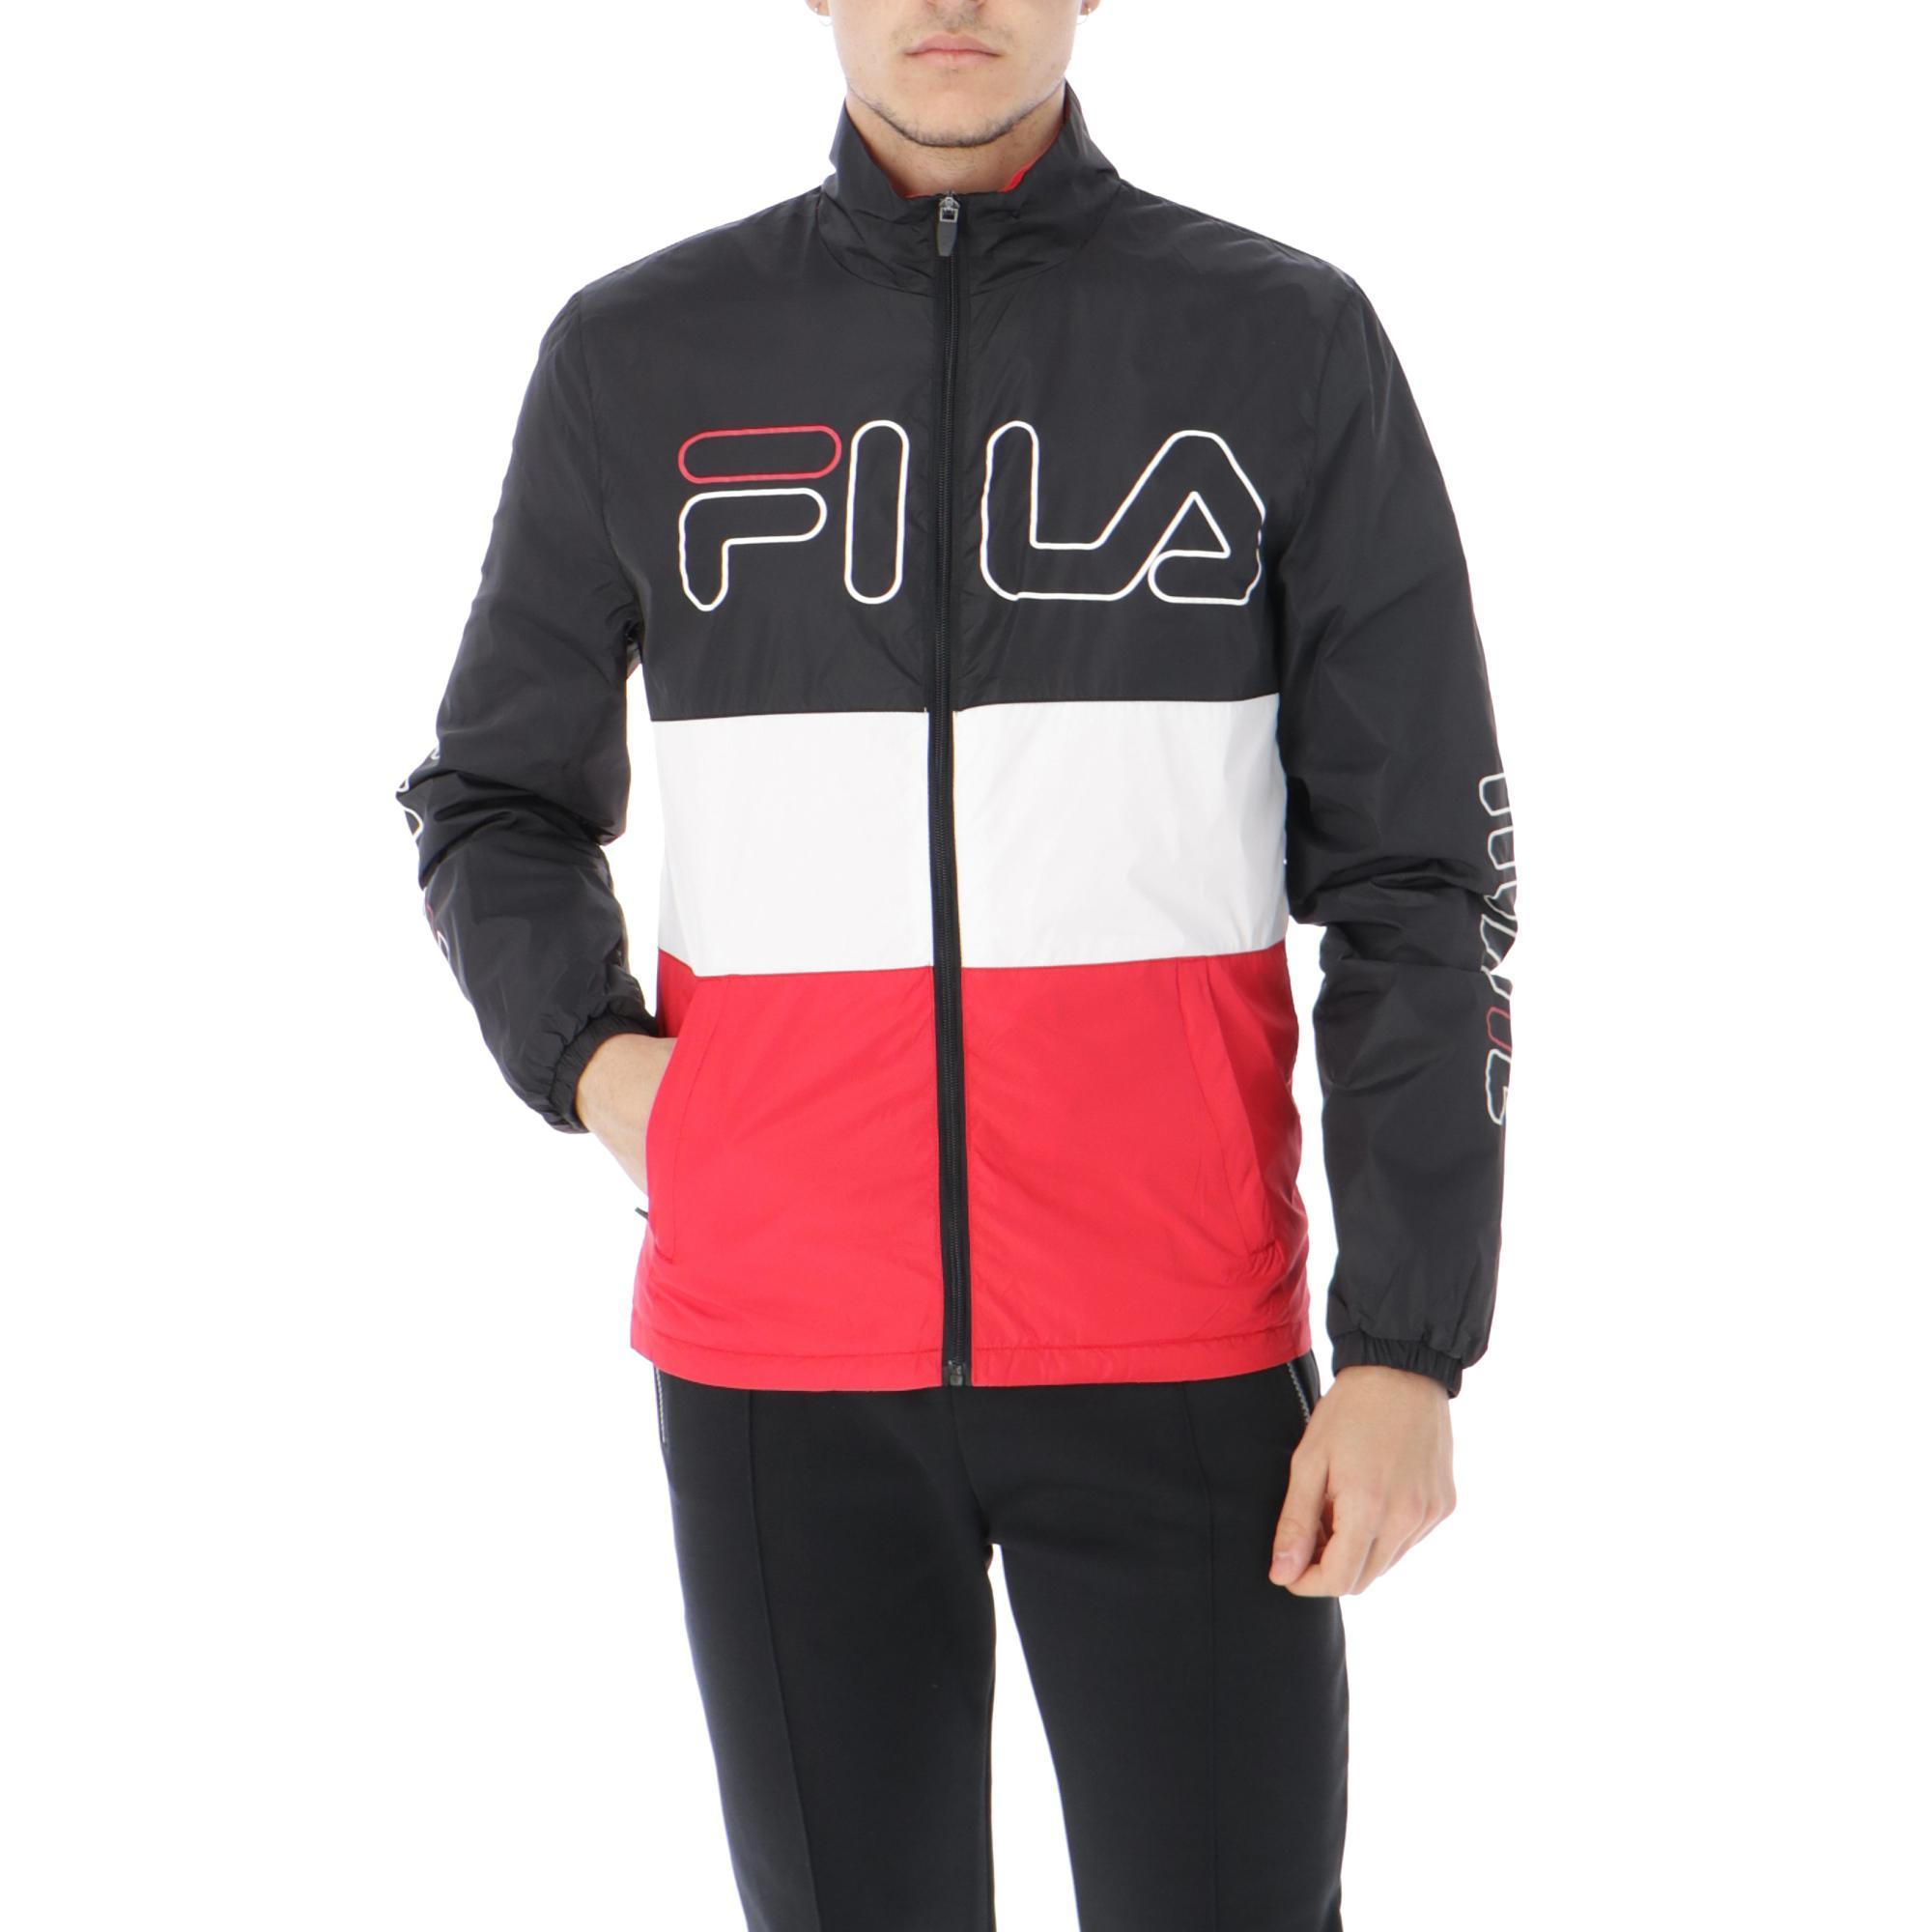 bc0c58ba4a136 Fila Hugo Track Jacket<br/> Black Red White | Treesse